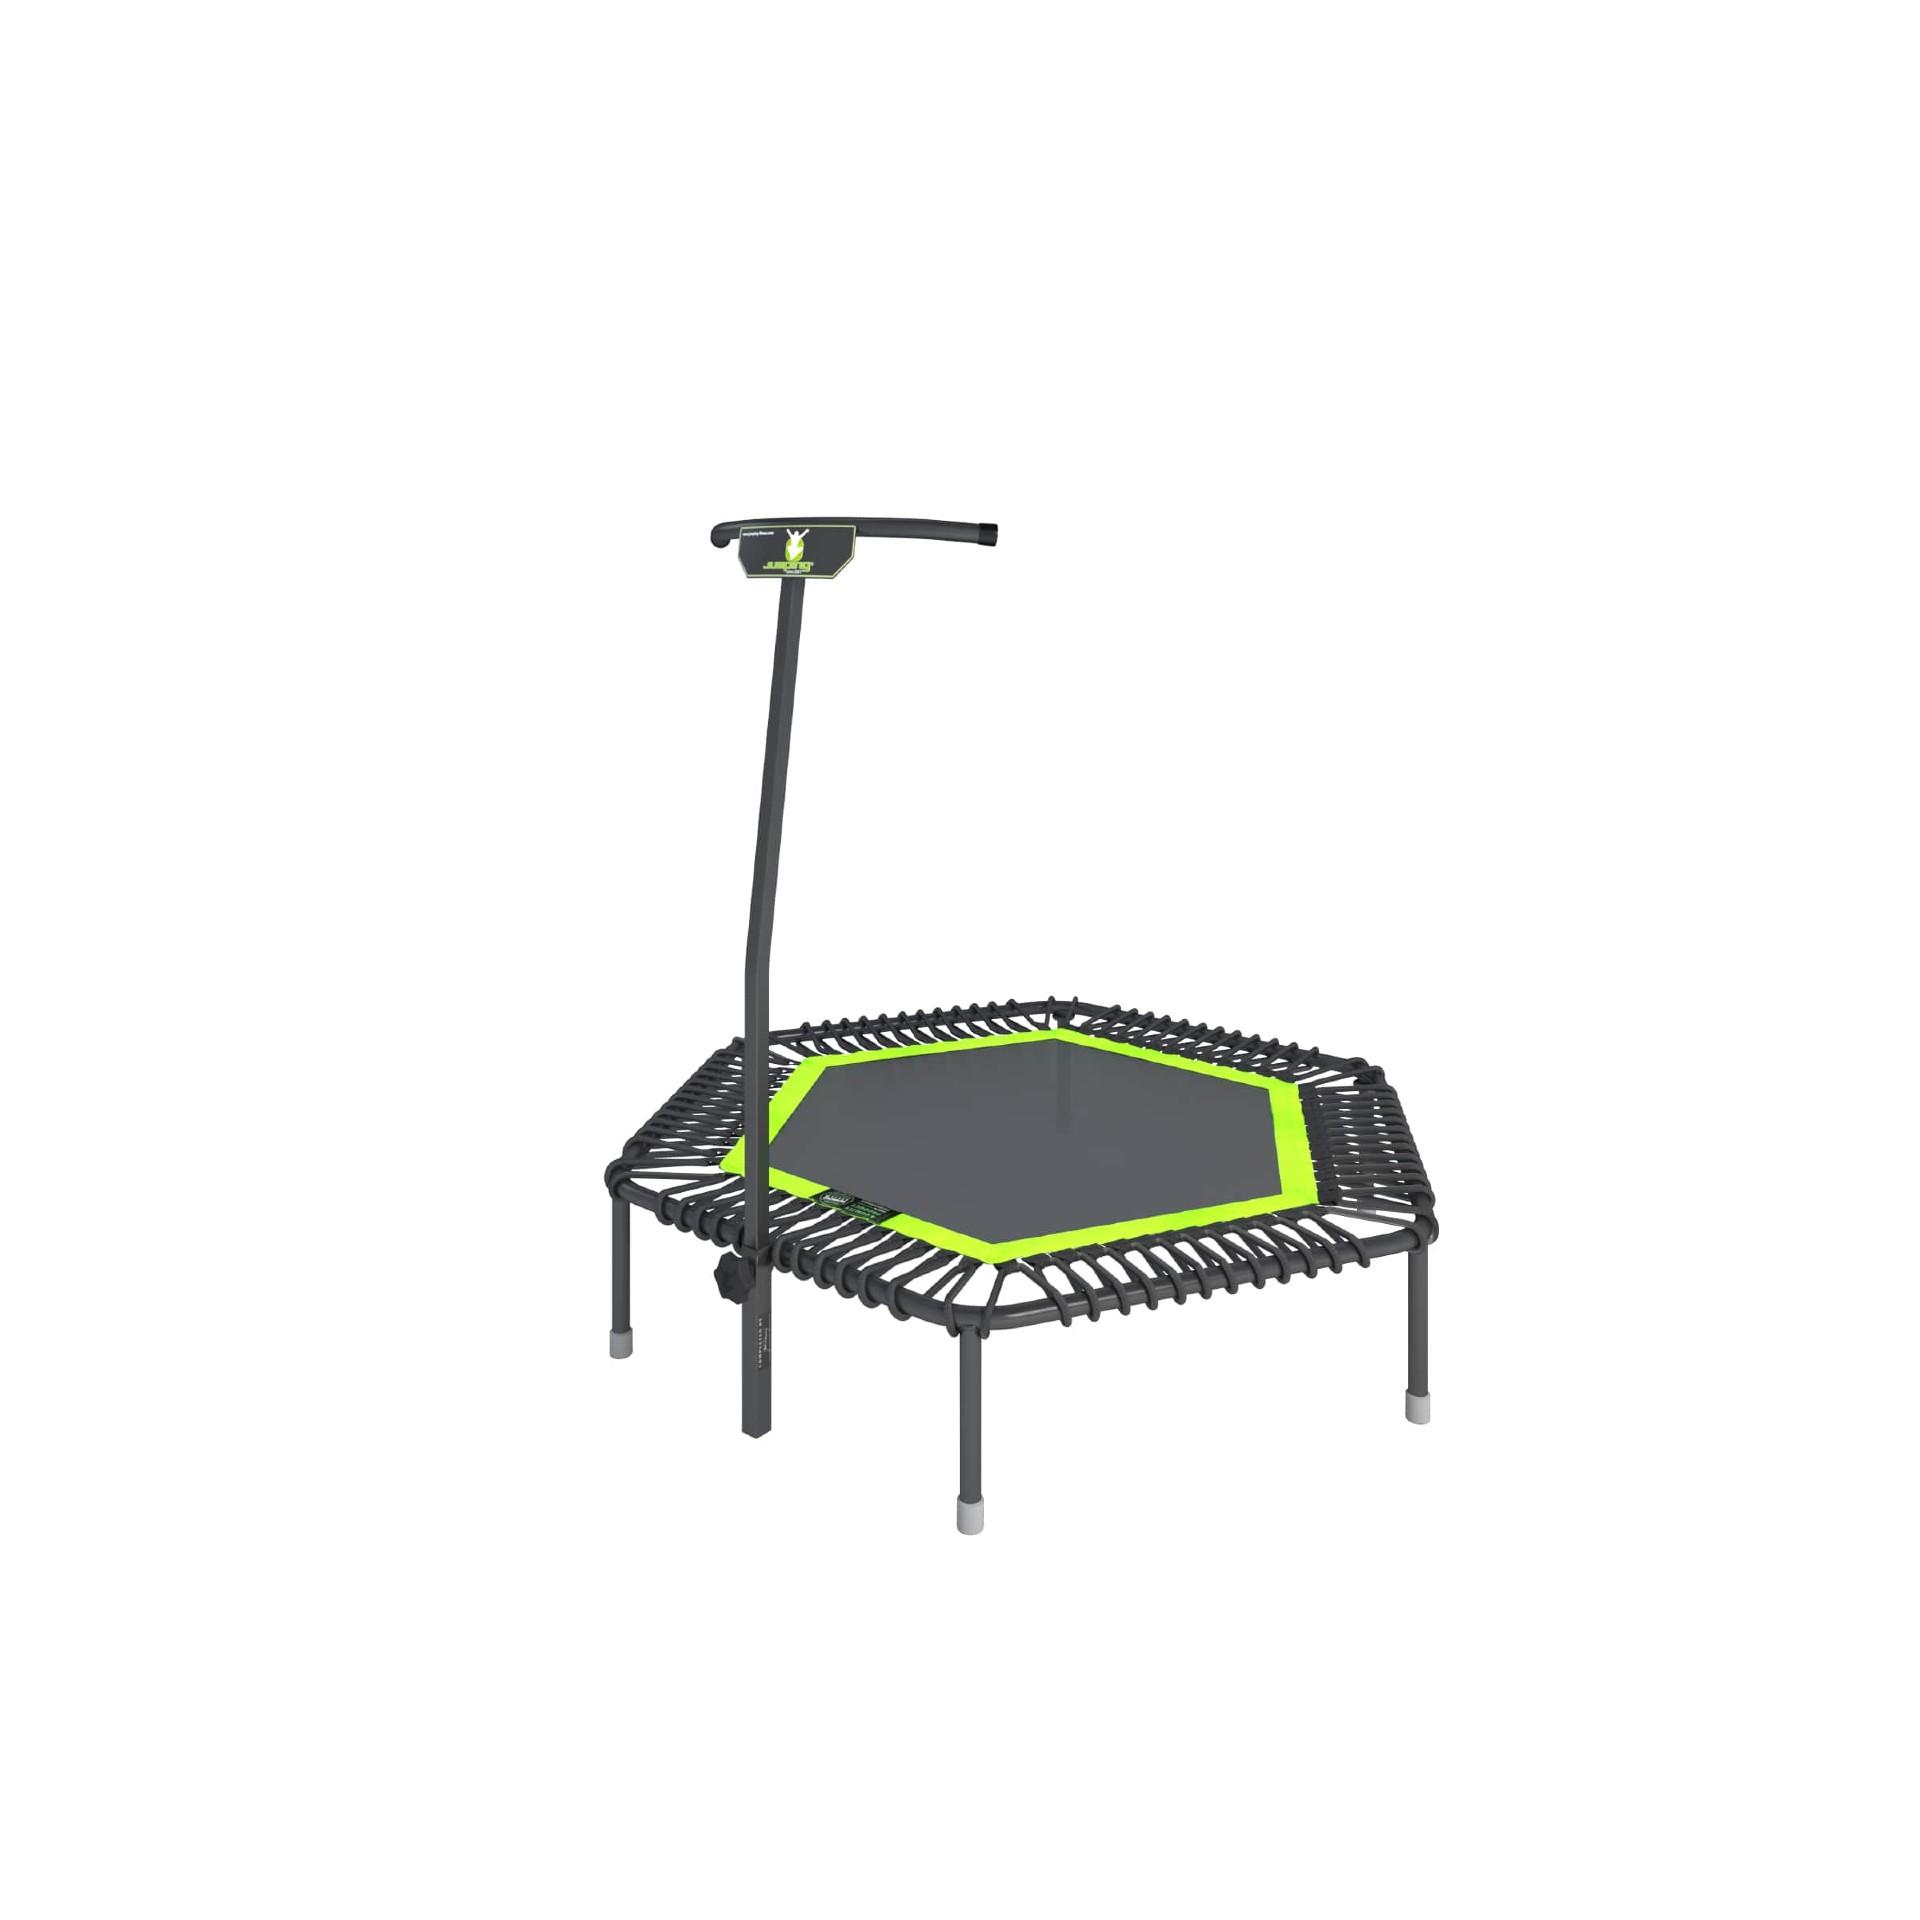 Jumping® PROFI Standard PLUS trampolína